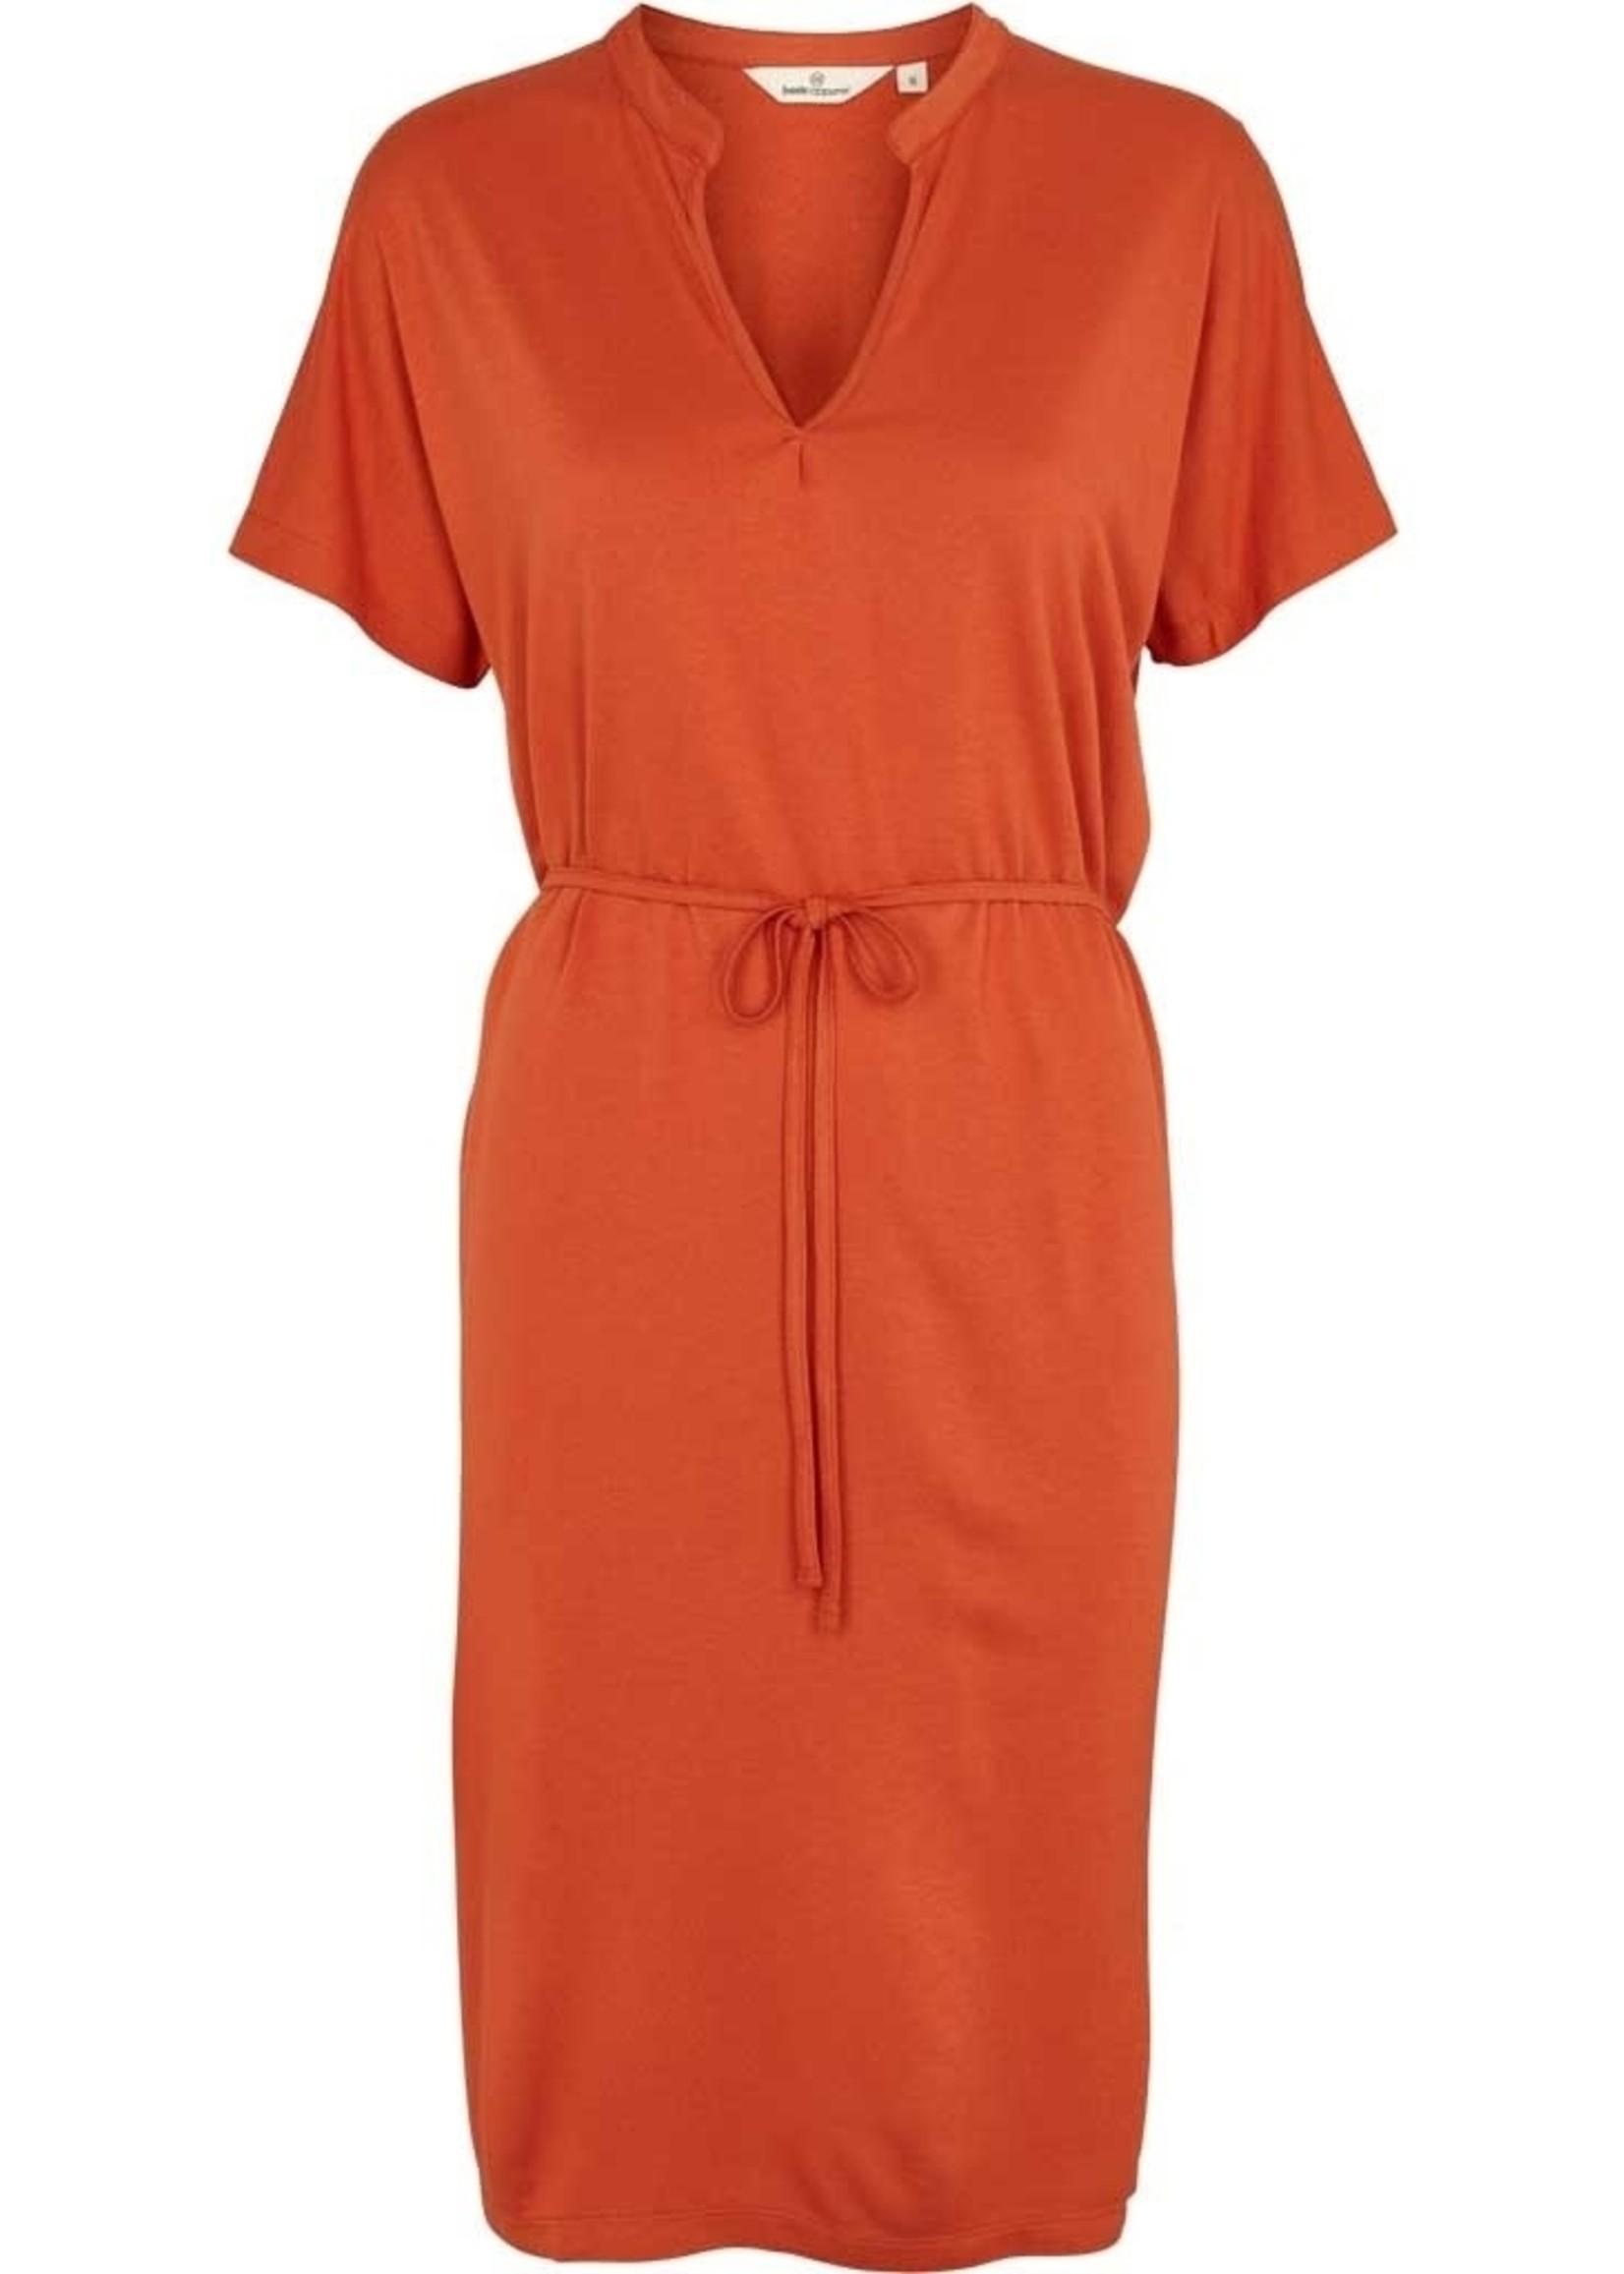 Basic Apparel Karen Dress